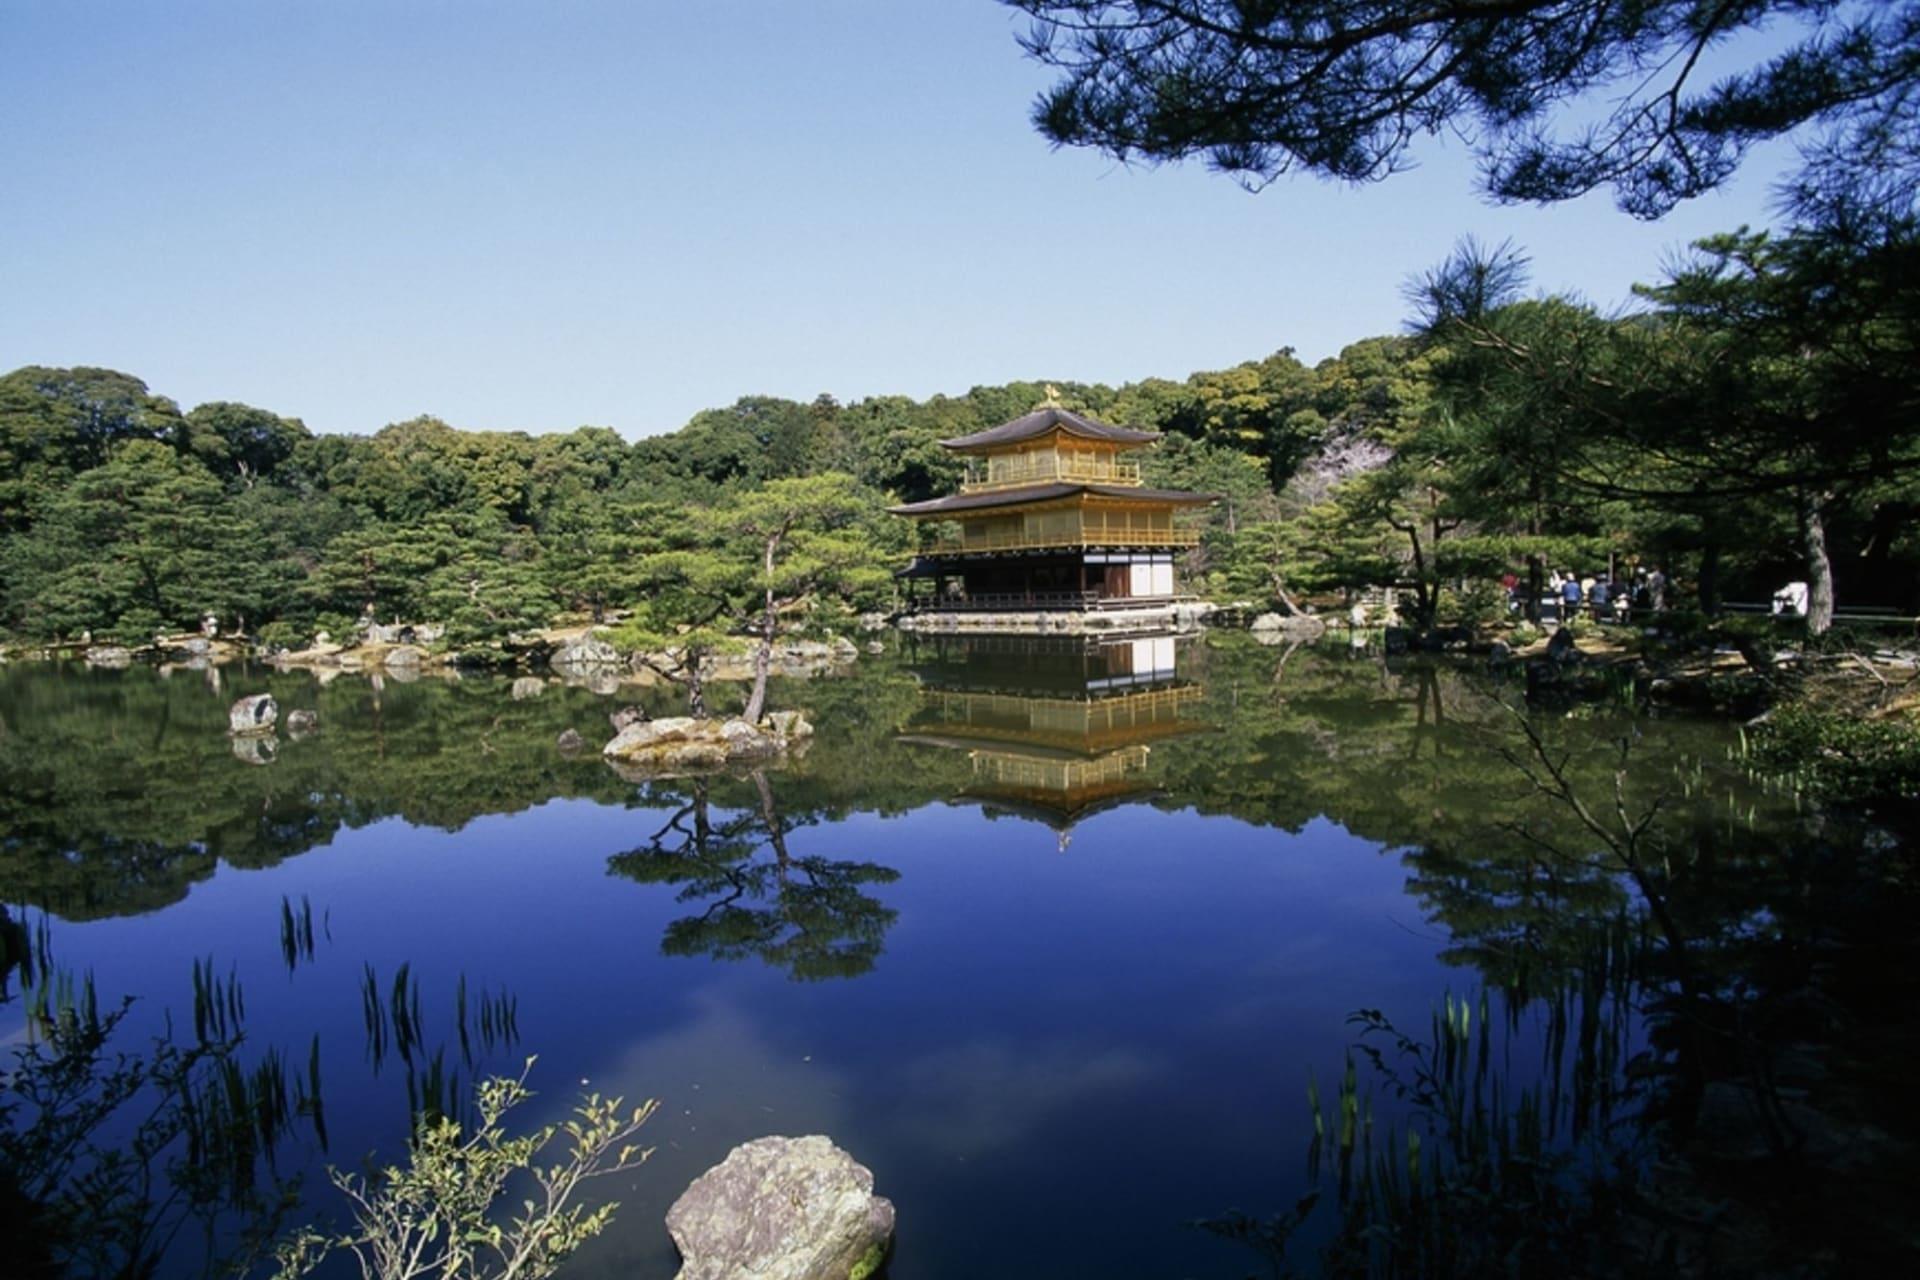 Kyoto Golden Pavilion Kinkakuji